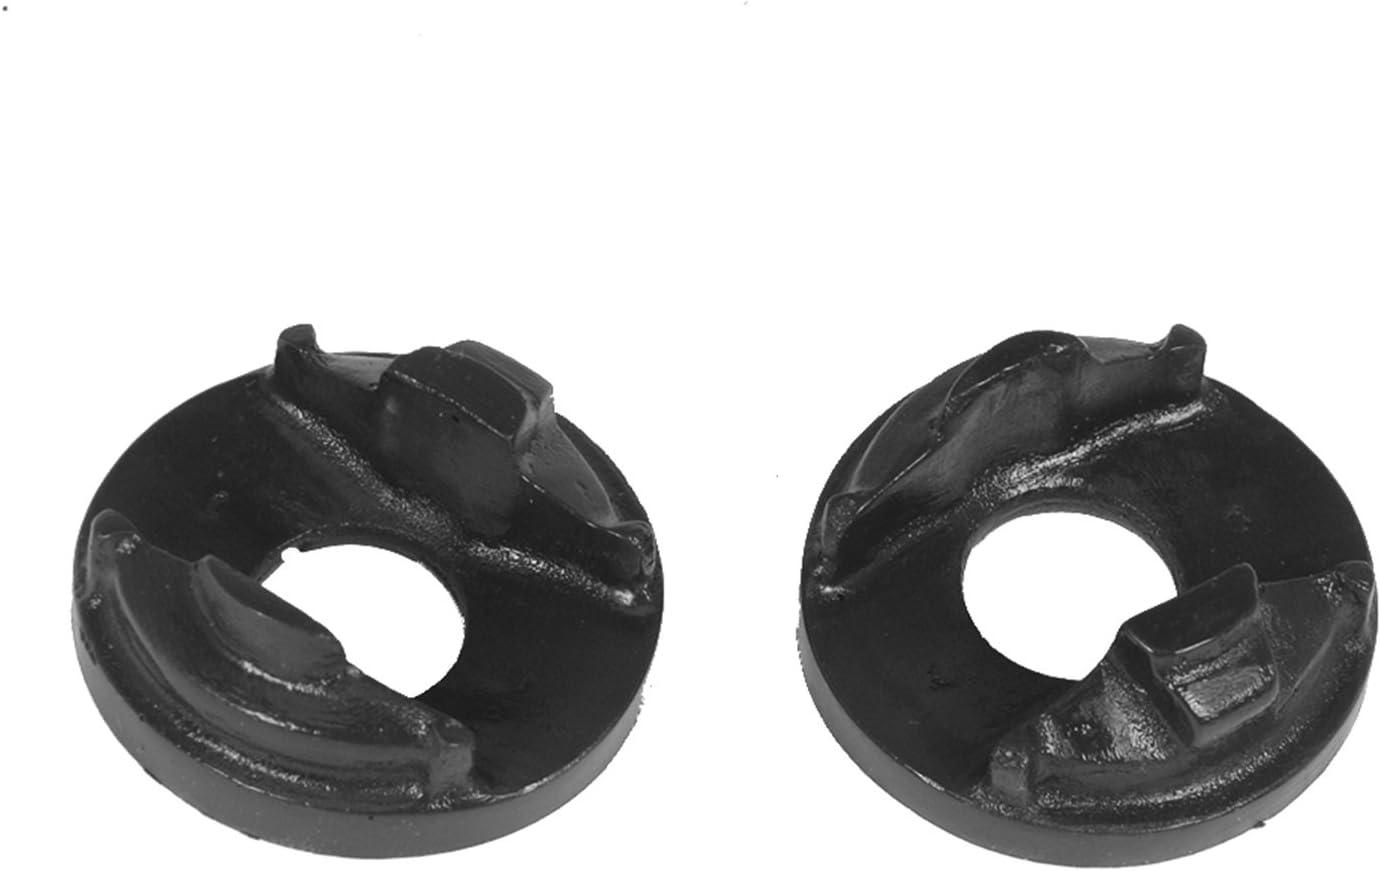 Prothane 14-502-BL Black Right Engine Mount Insert Kit